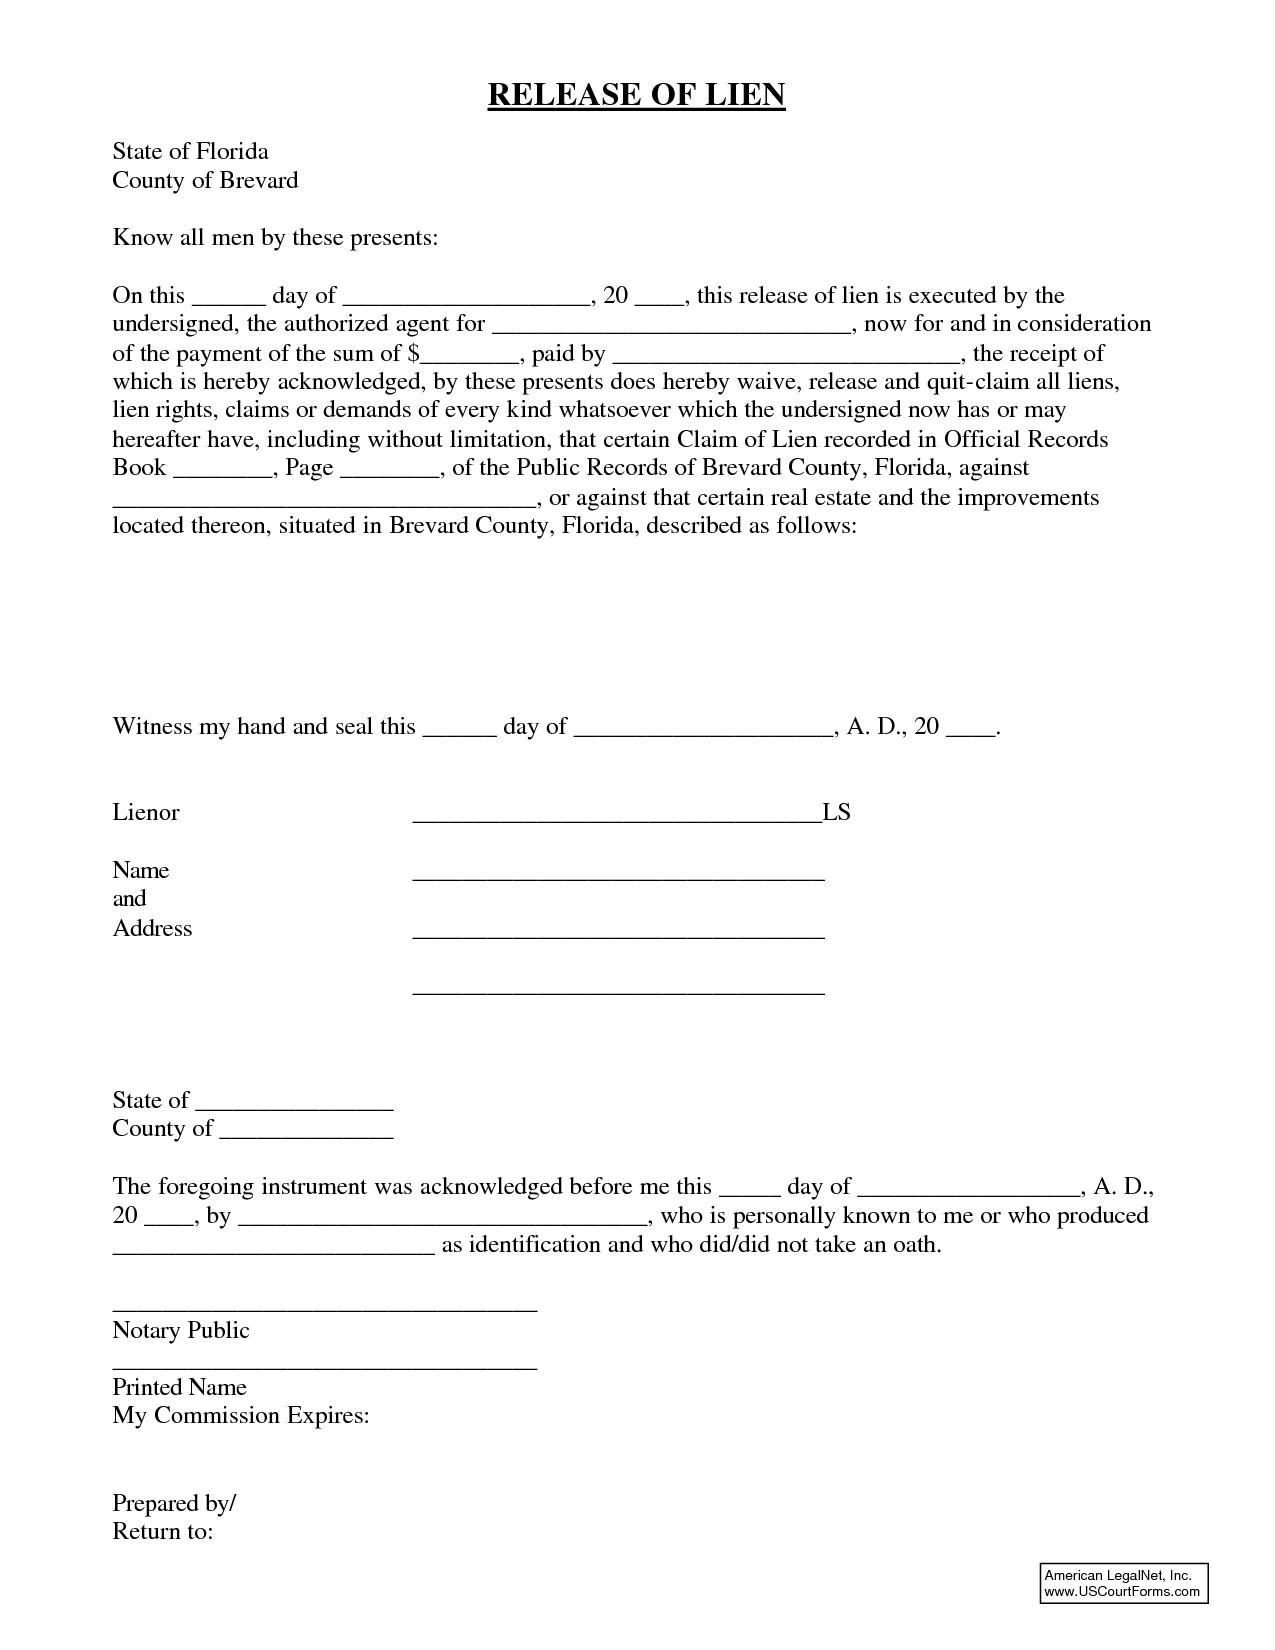 Florida Lien Release forms Release Of Lien form Florida the Hidden Agenda Release